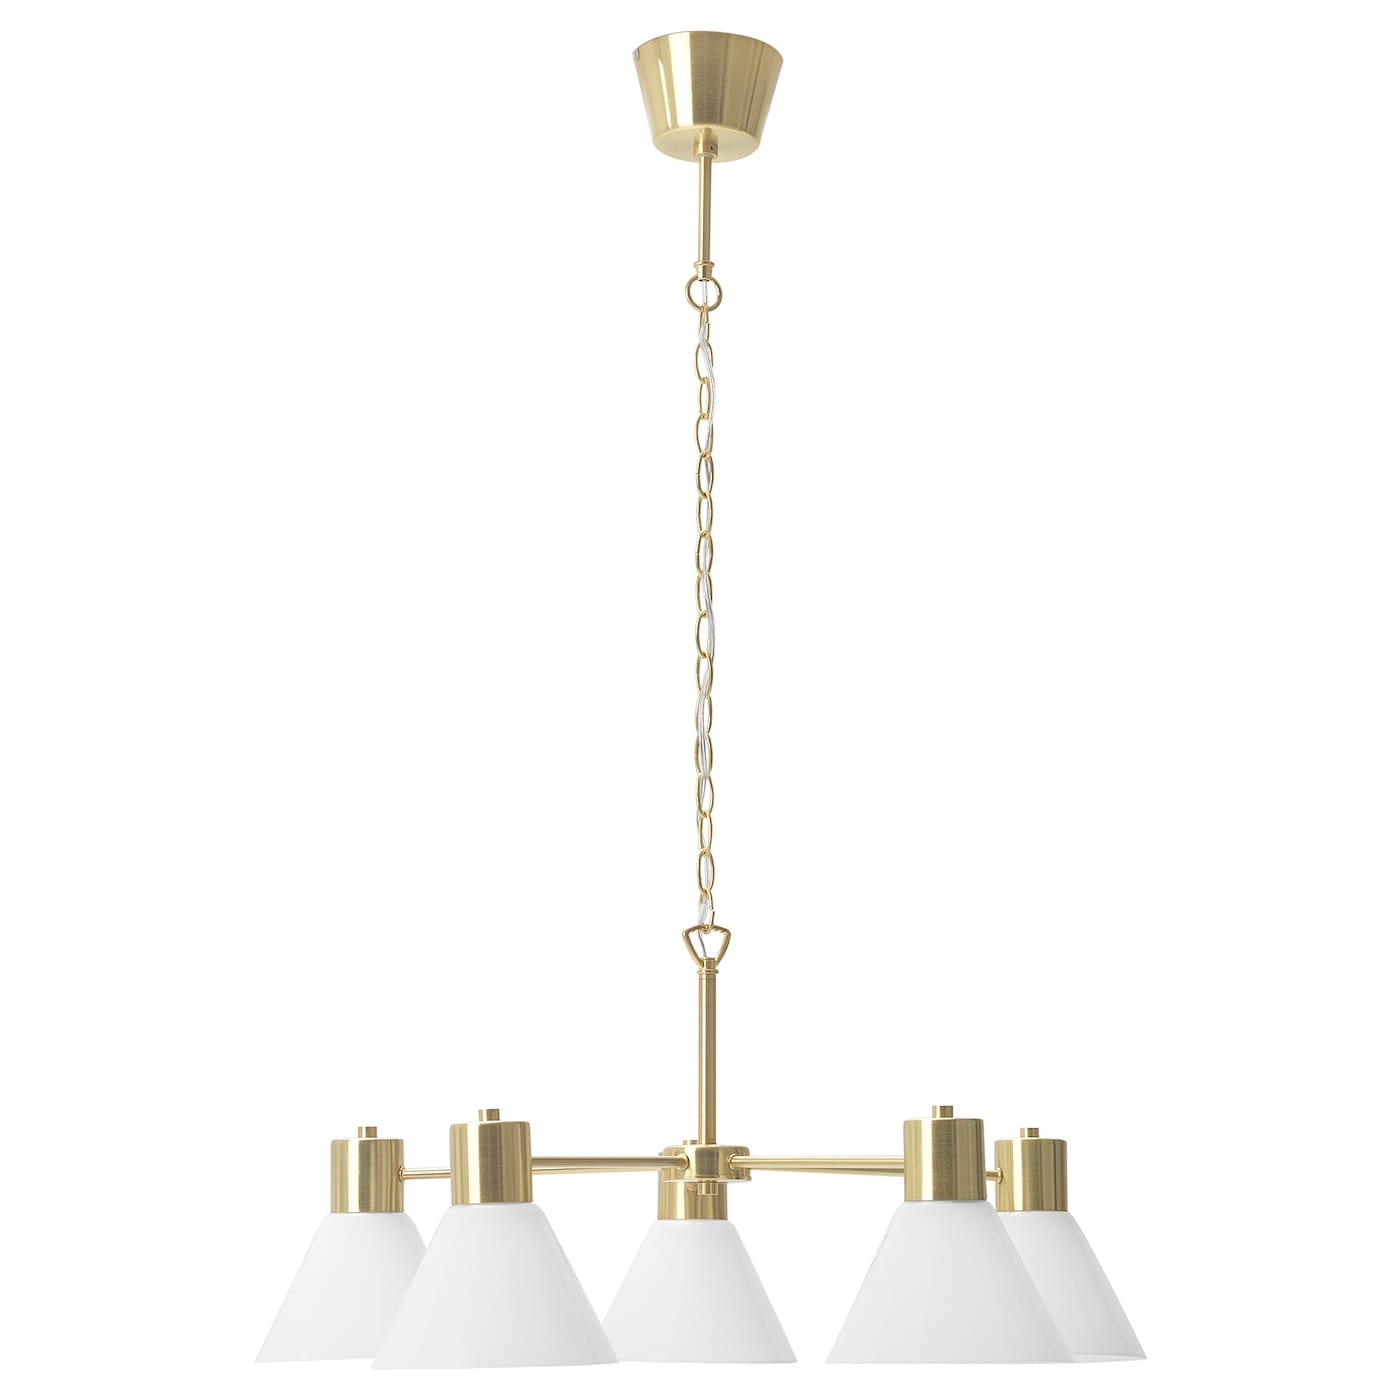 Hook for IKEA Lights Chandelier Pendant